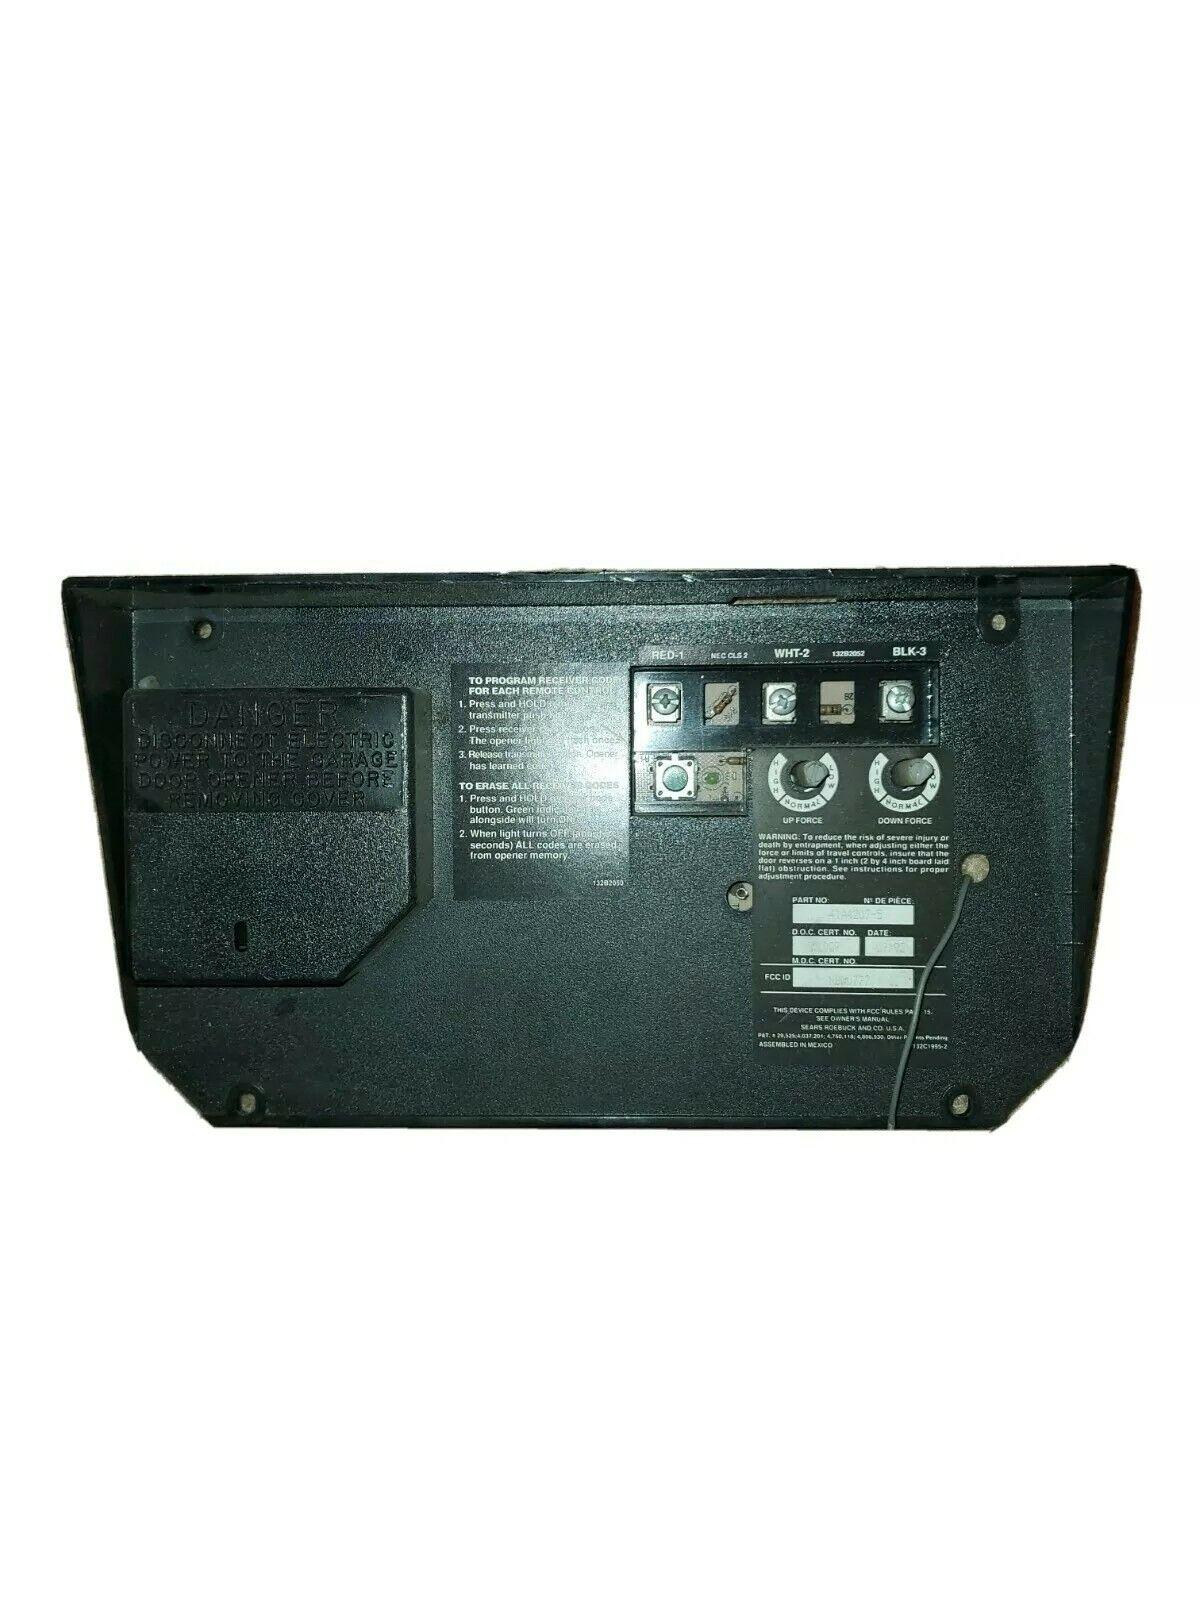 Craftsman Chamberlain Logic Board 41a4207 5 For Sale Online